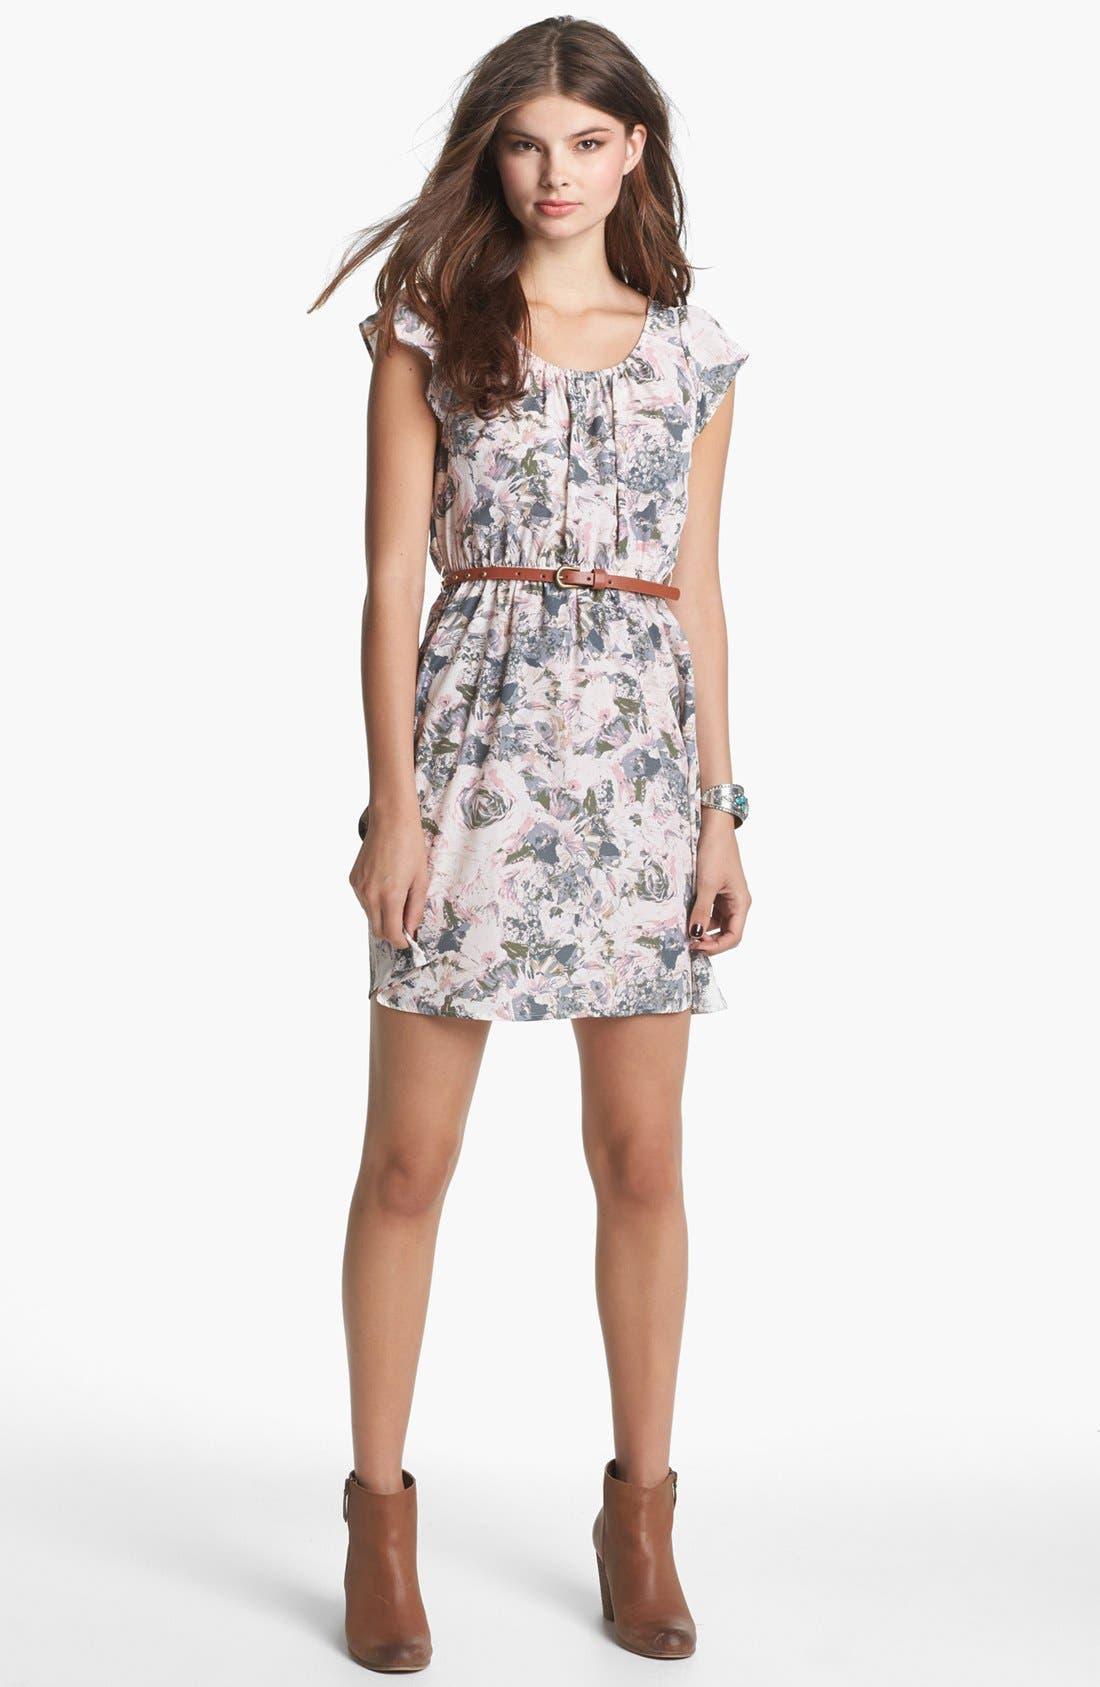 Main Image - Socialite Cage Back Floral Print Dress (Juniors) (Online Only)